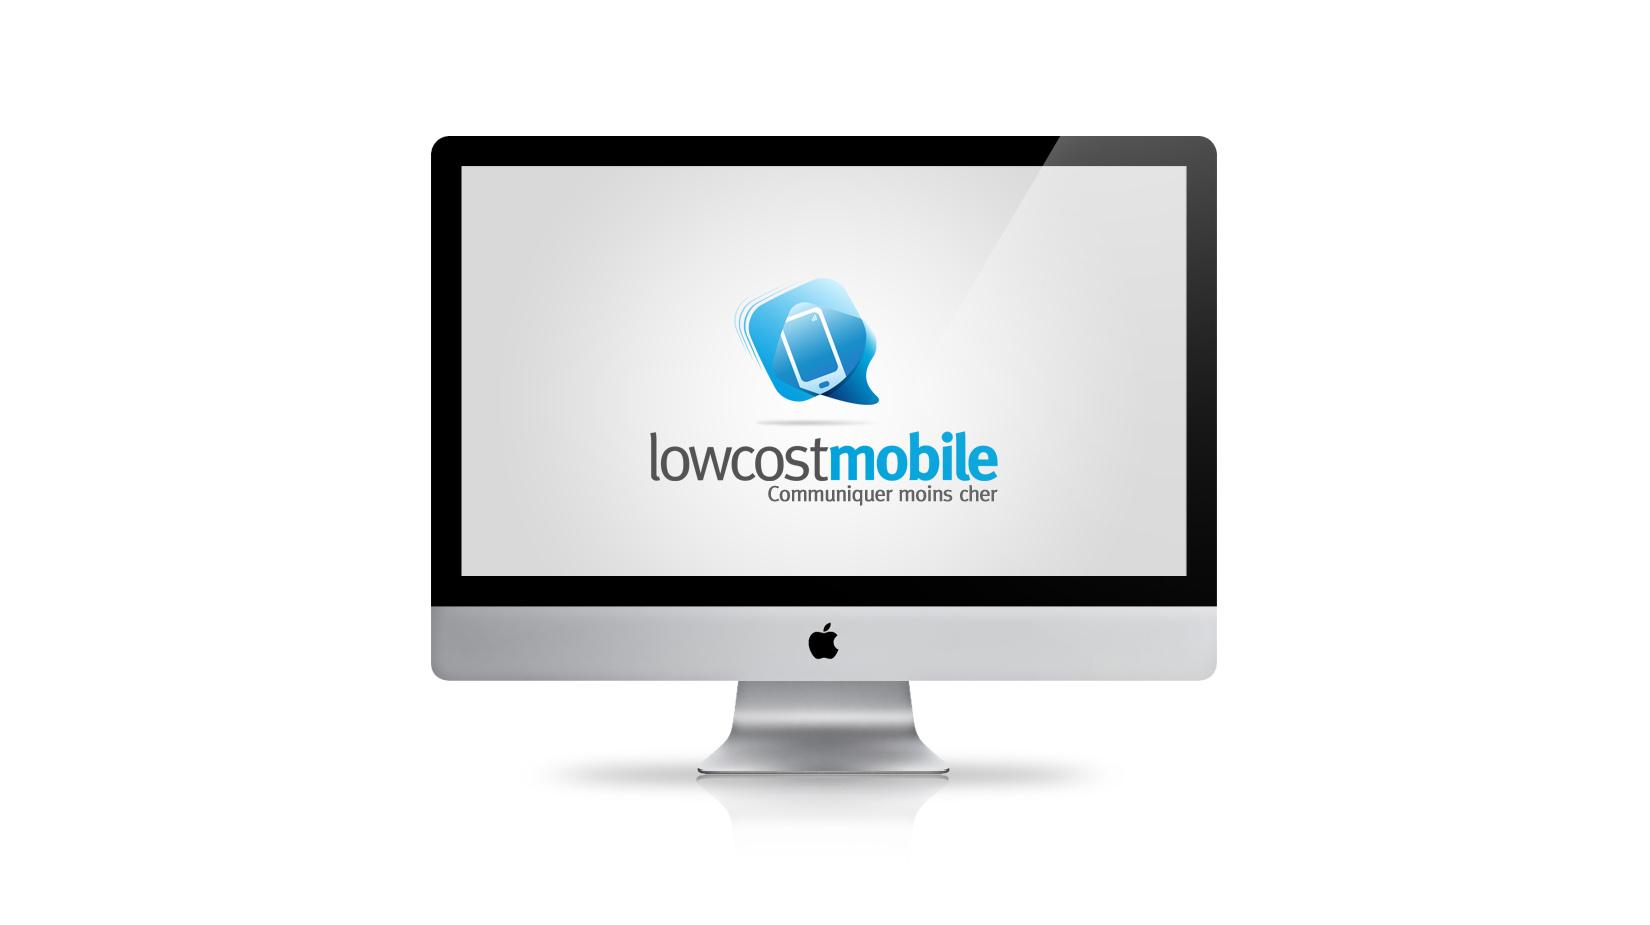 logo-lowcostmobile